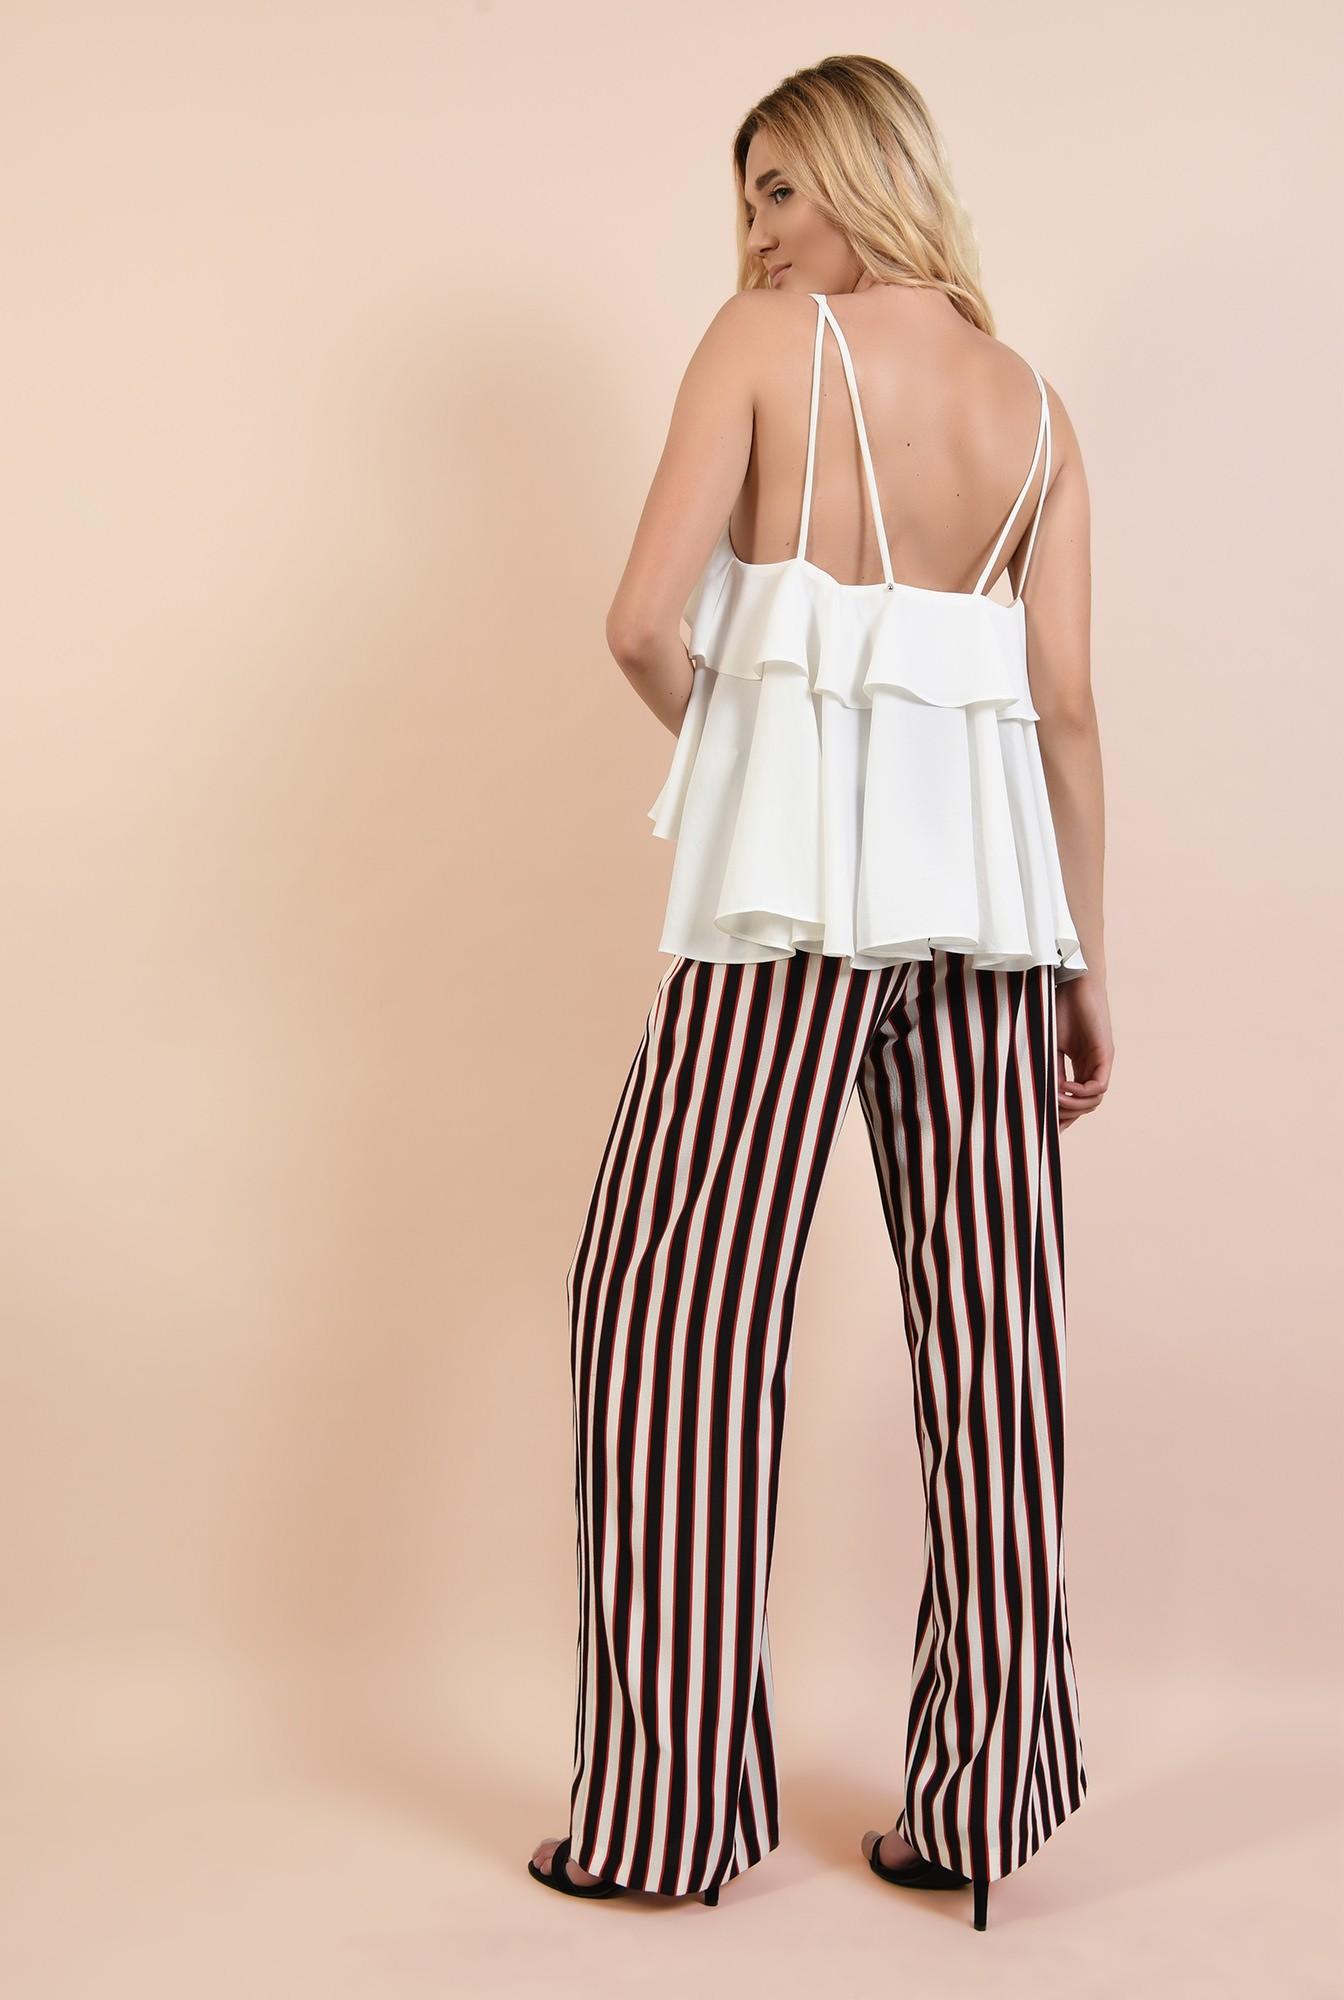 1 - 360 - pantaloni cu dungi, drepti, croi lejer, cu talie elastica, buzunare, Poema